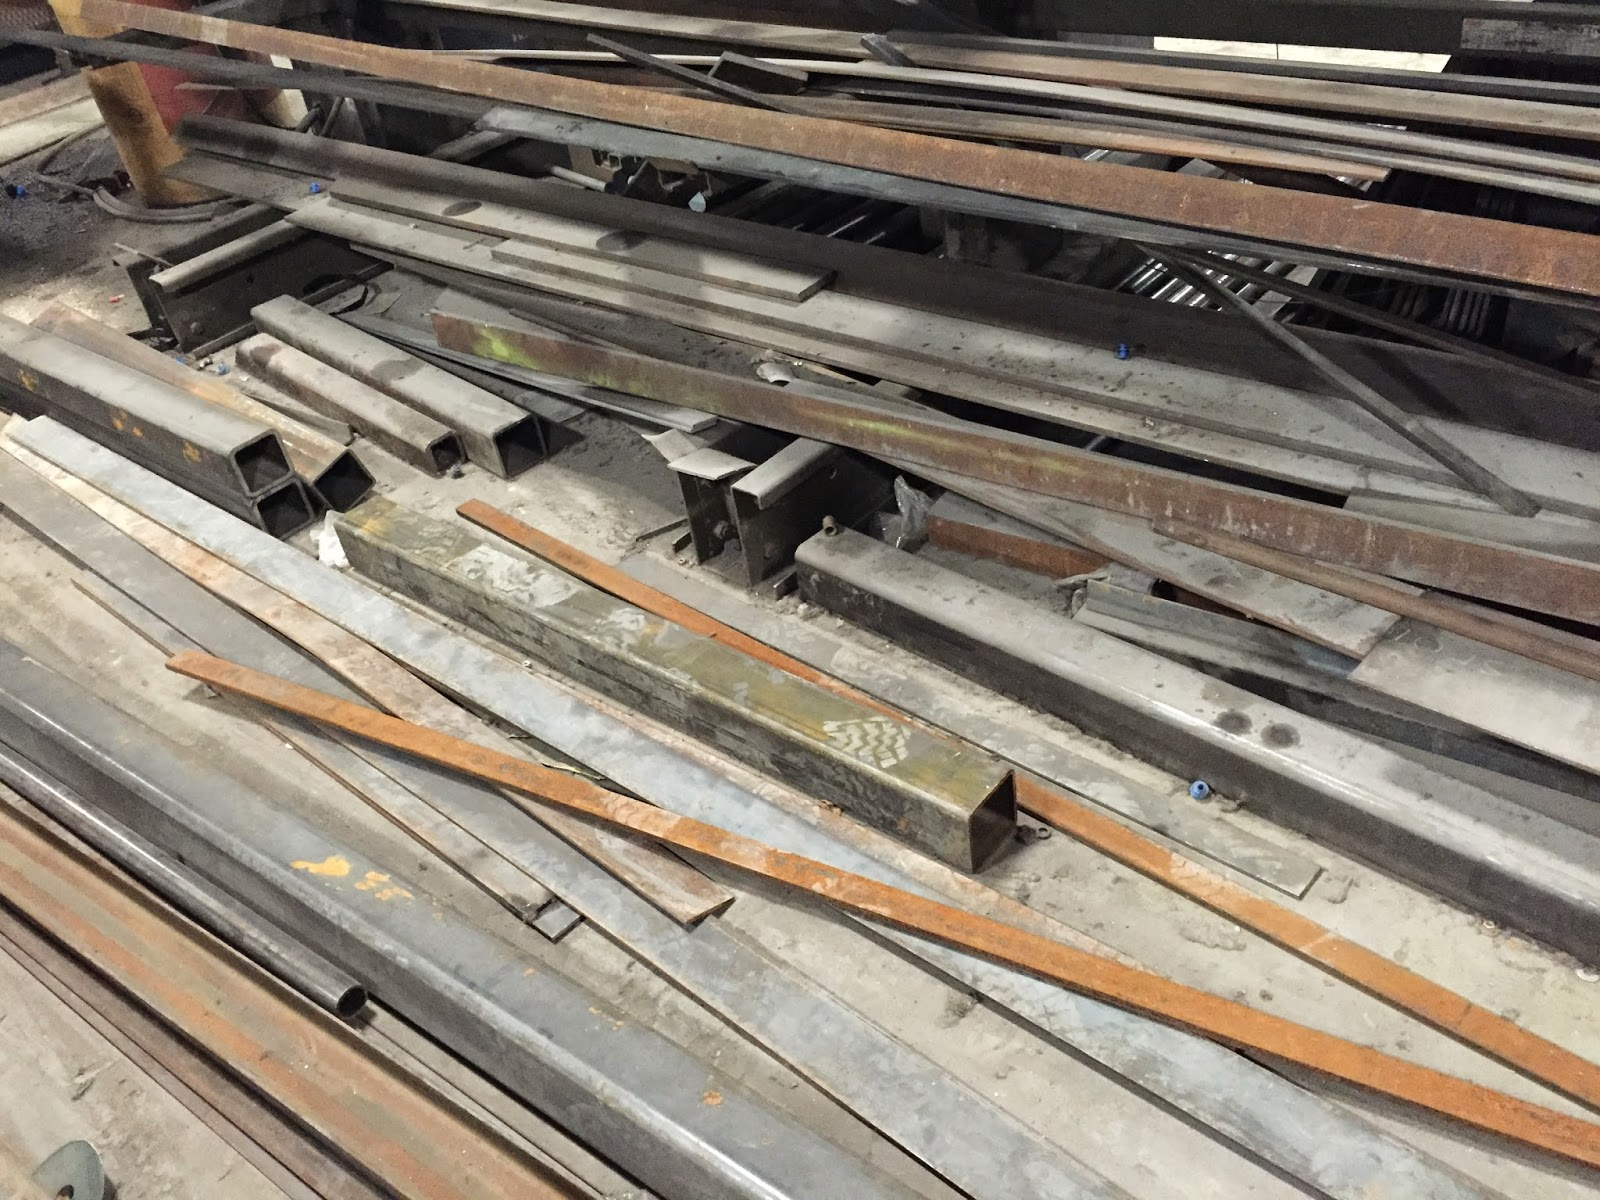 stainless steel, 801 N John St, Goldsboro, NC, 27530, (919) 731-5600